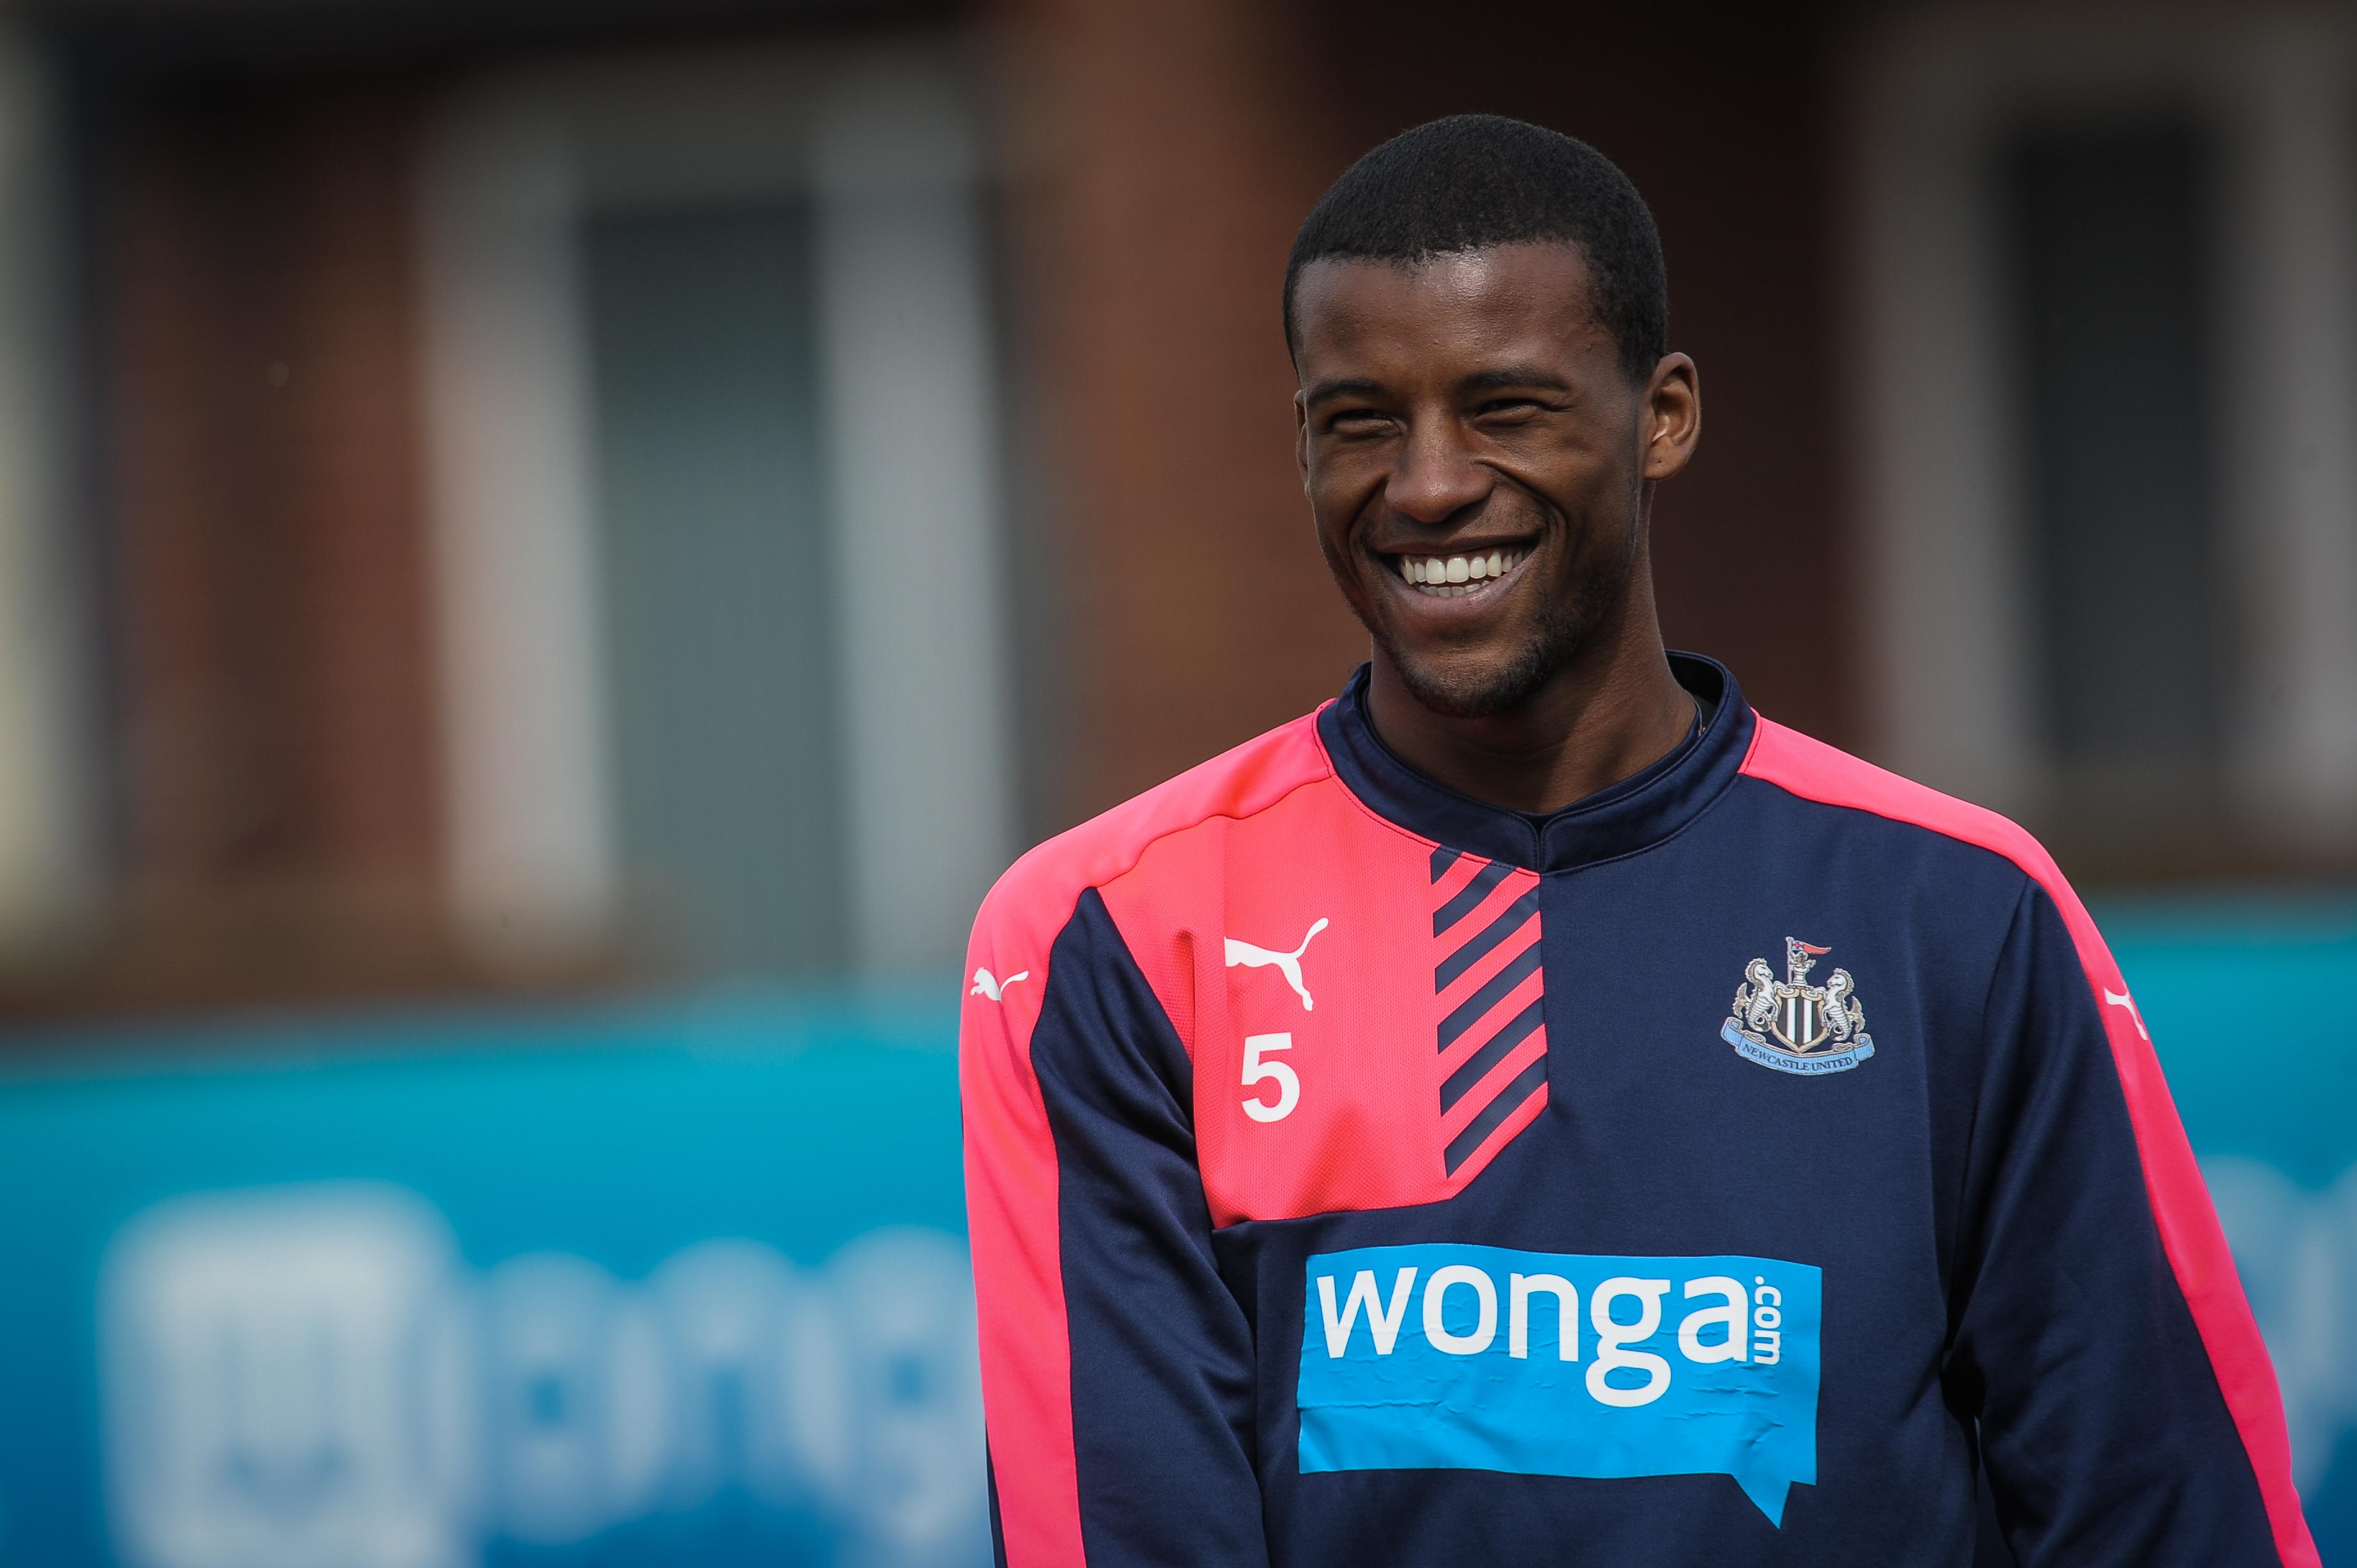 Liverpool agree £25m deal for transfer of Newcastle's Georginio Wijnaldum